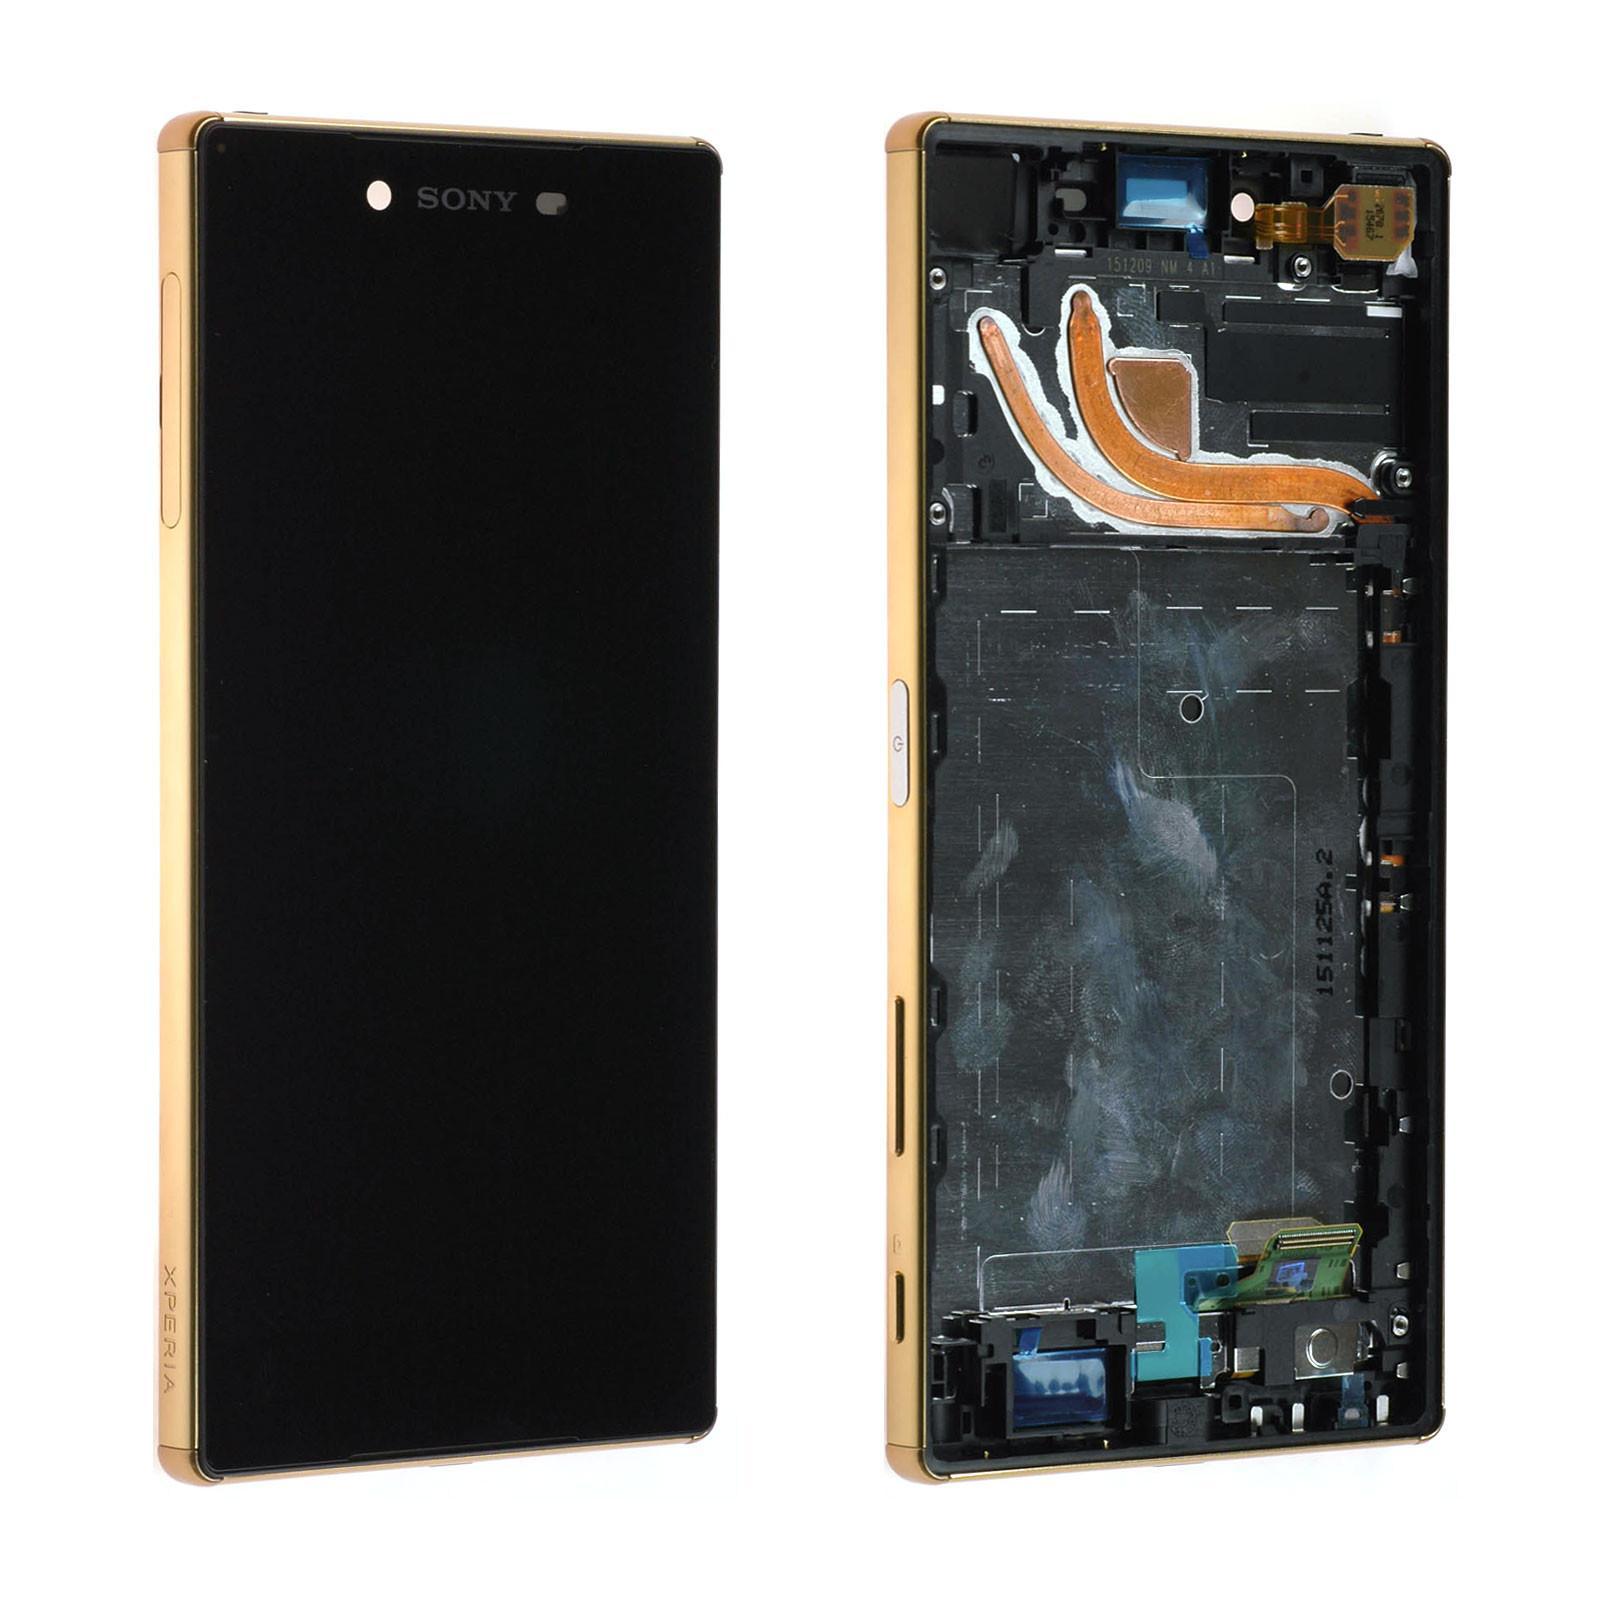 Sony Xperia Z5 Premium 32 GB - Gold - Ohne Vertrag